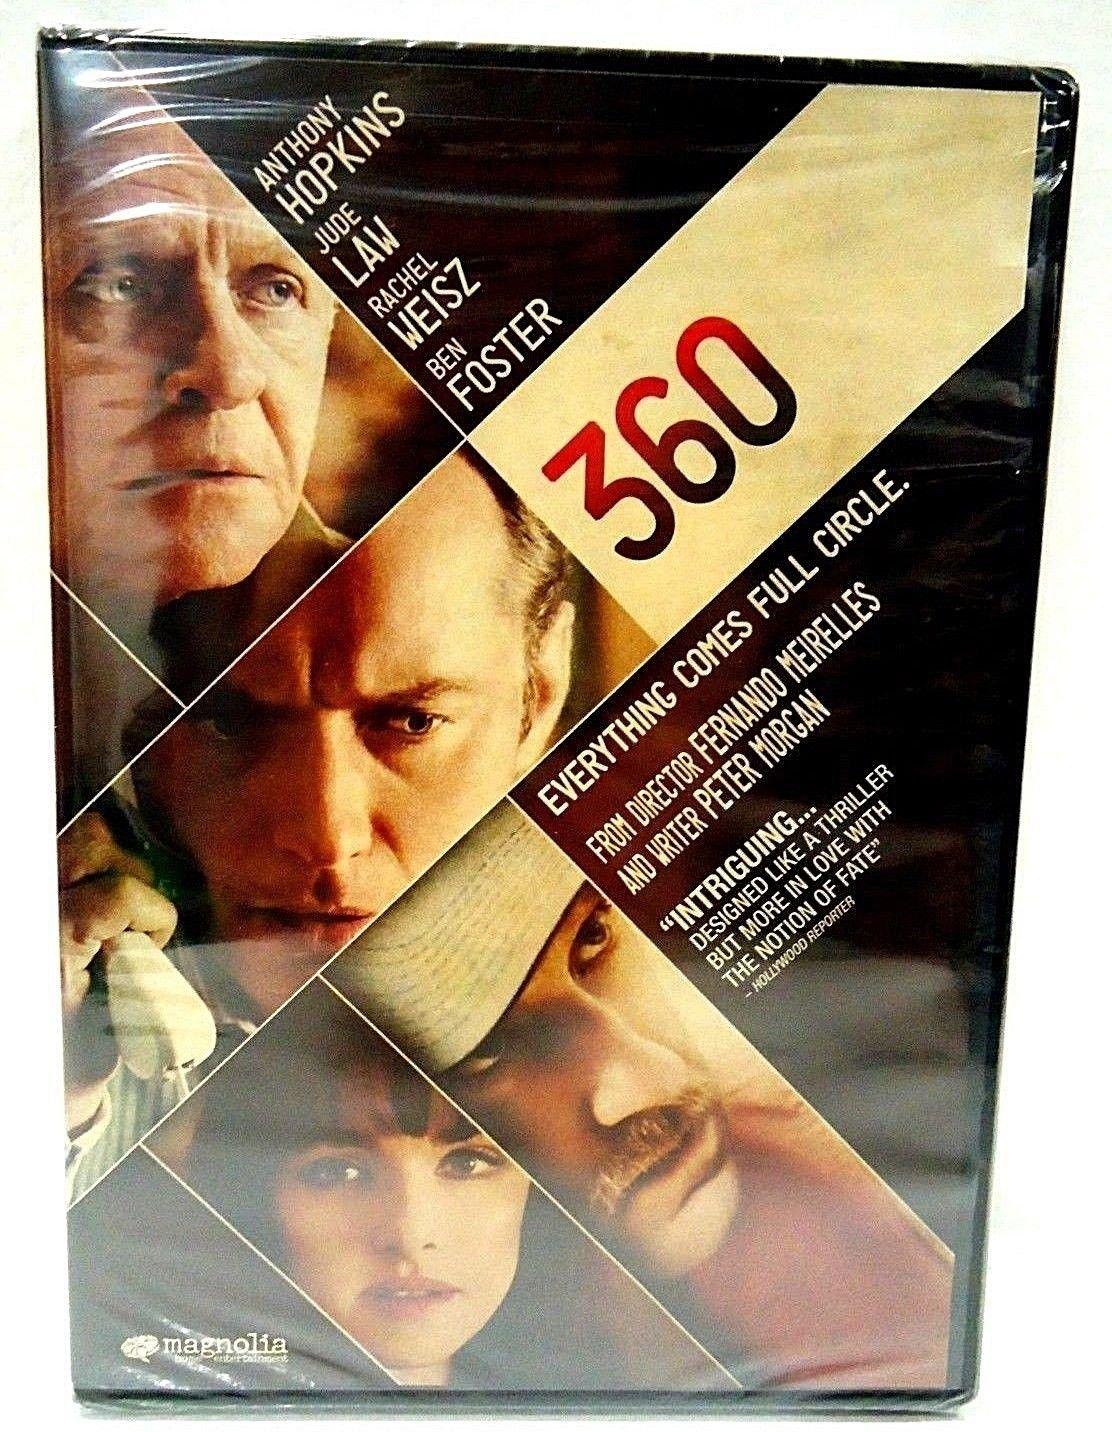 360 - DVD - ANTHONY HOPKINS - JUDE LAW - NEW - ROMANCE - THRILLER - CRIME - FILM